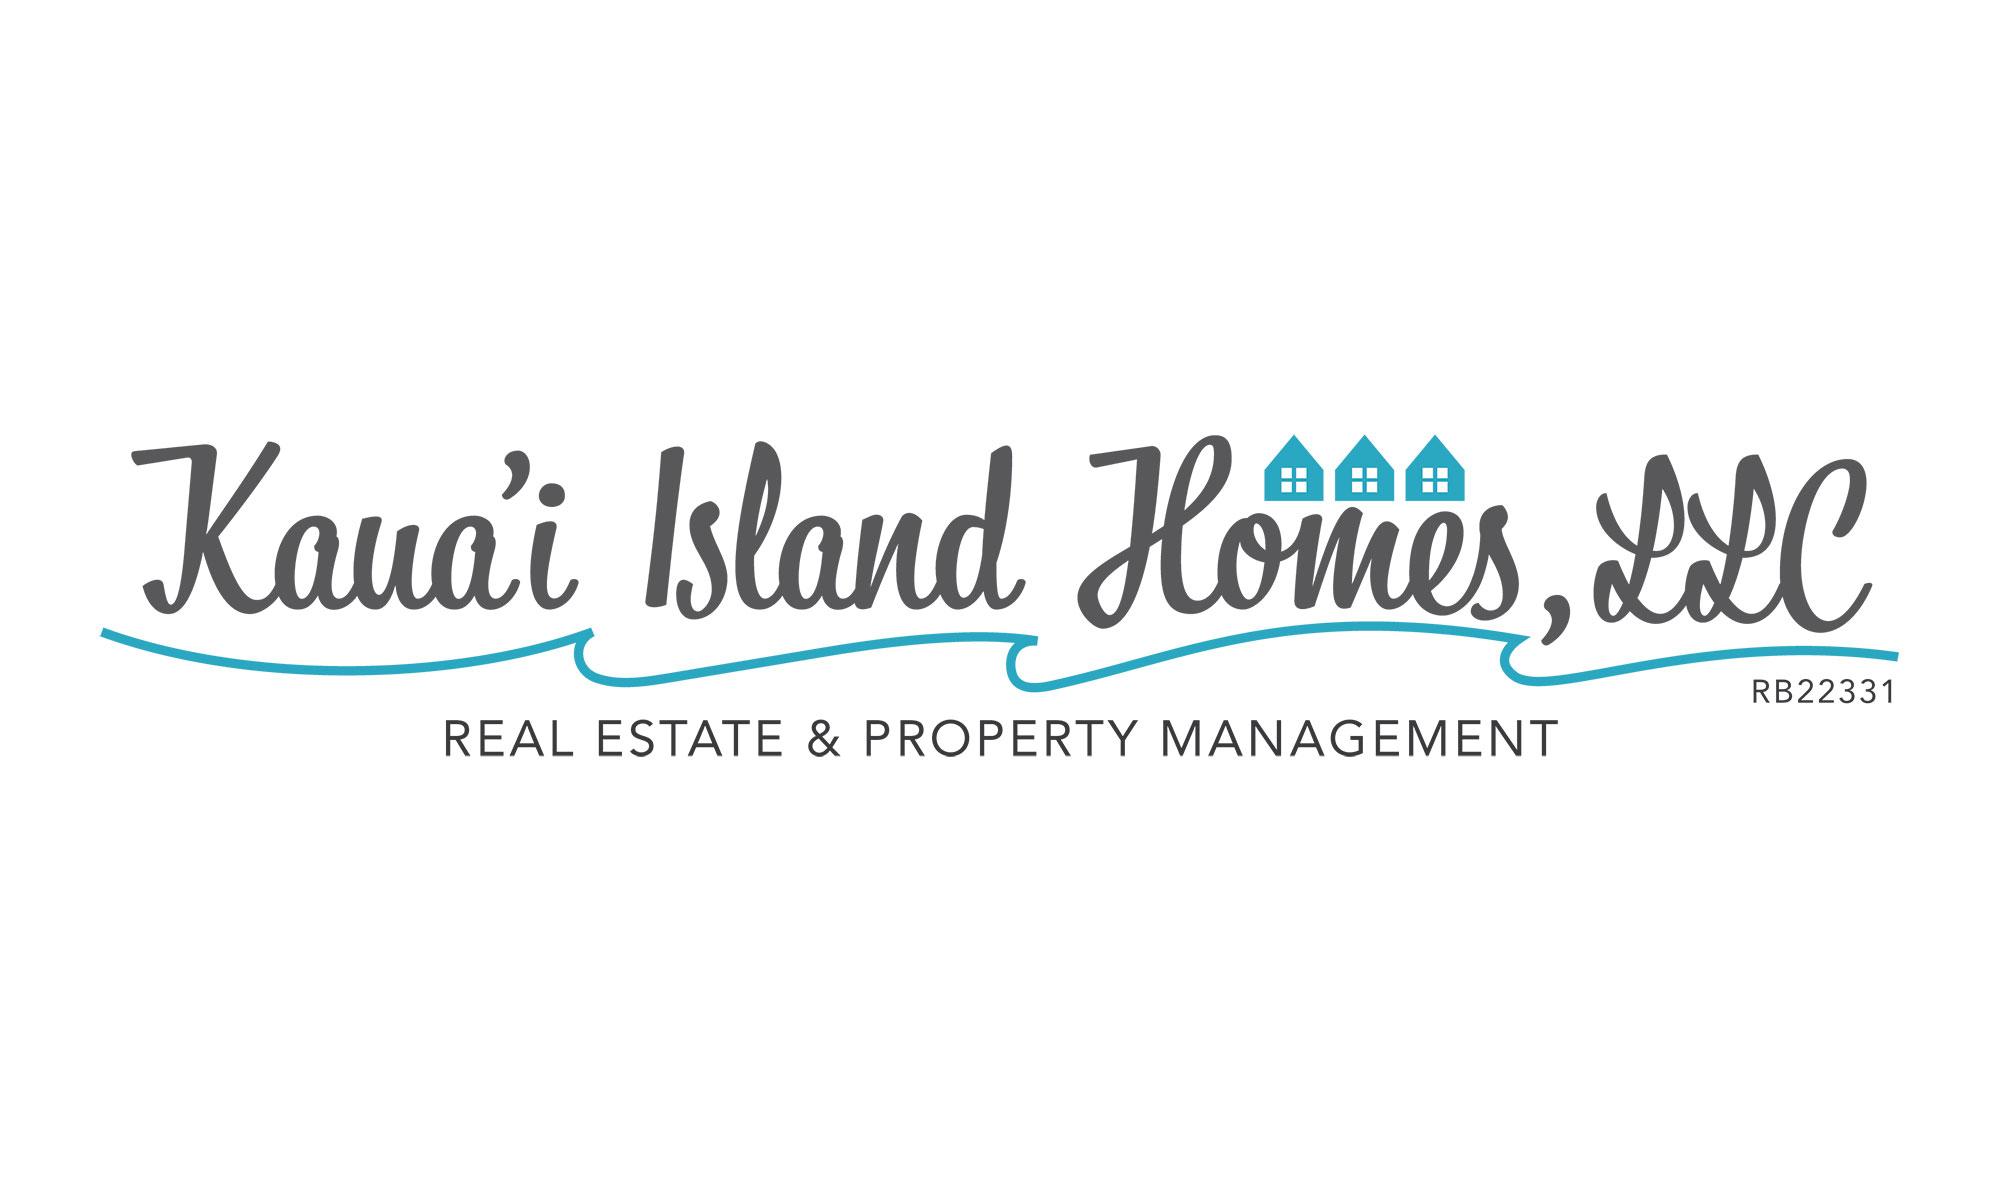 Kauai Island Homes, LLC